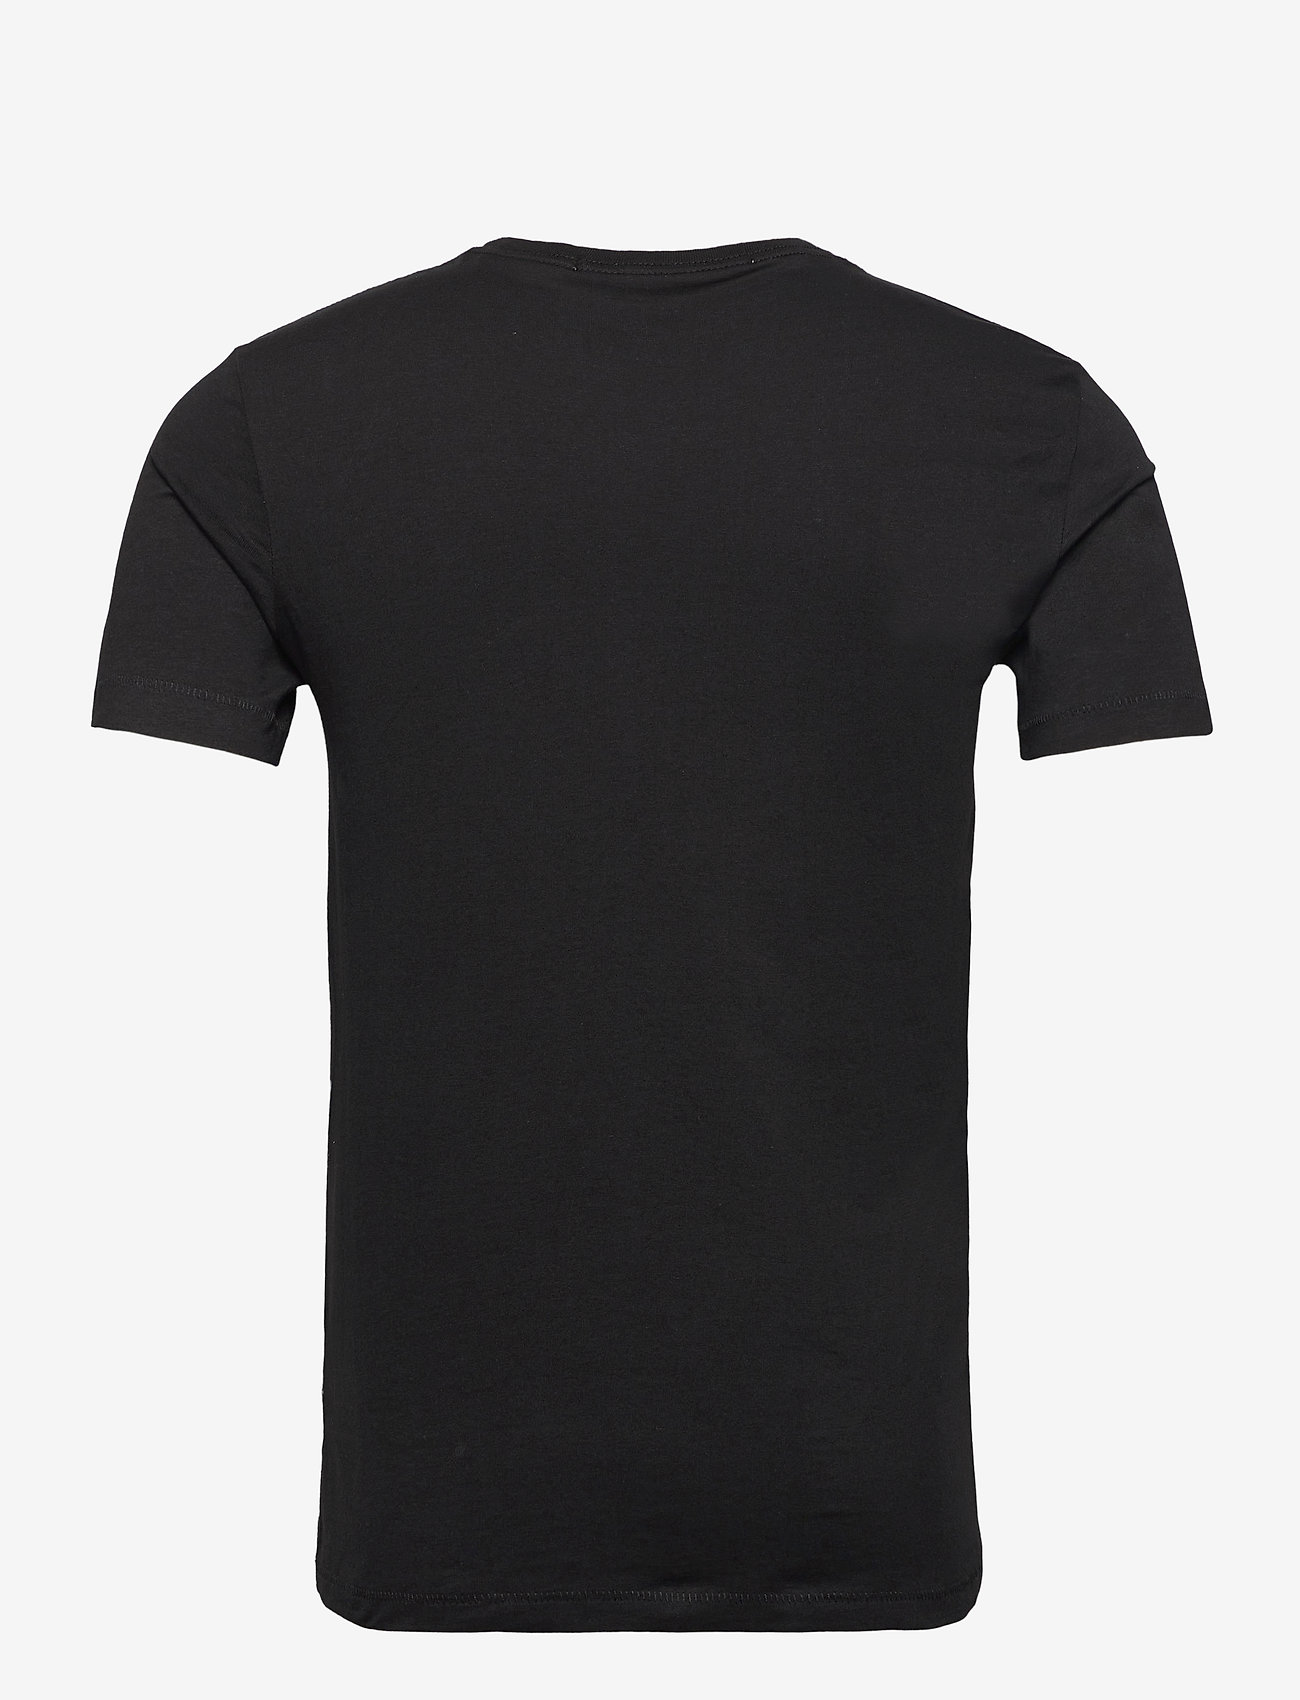 Calvin Klein Jeans - MIRROR LOGO SLIM FIT TEE - t-shirts à manches courtes - ck black - 1